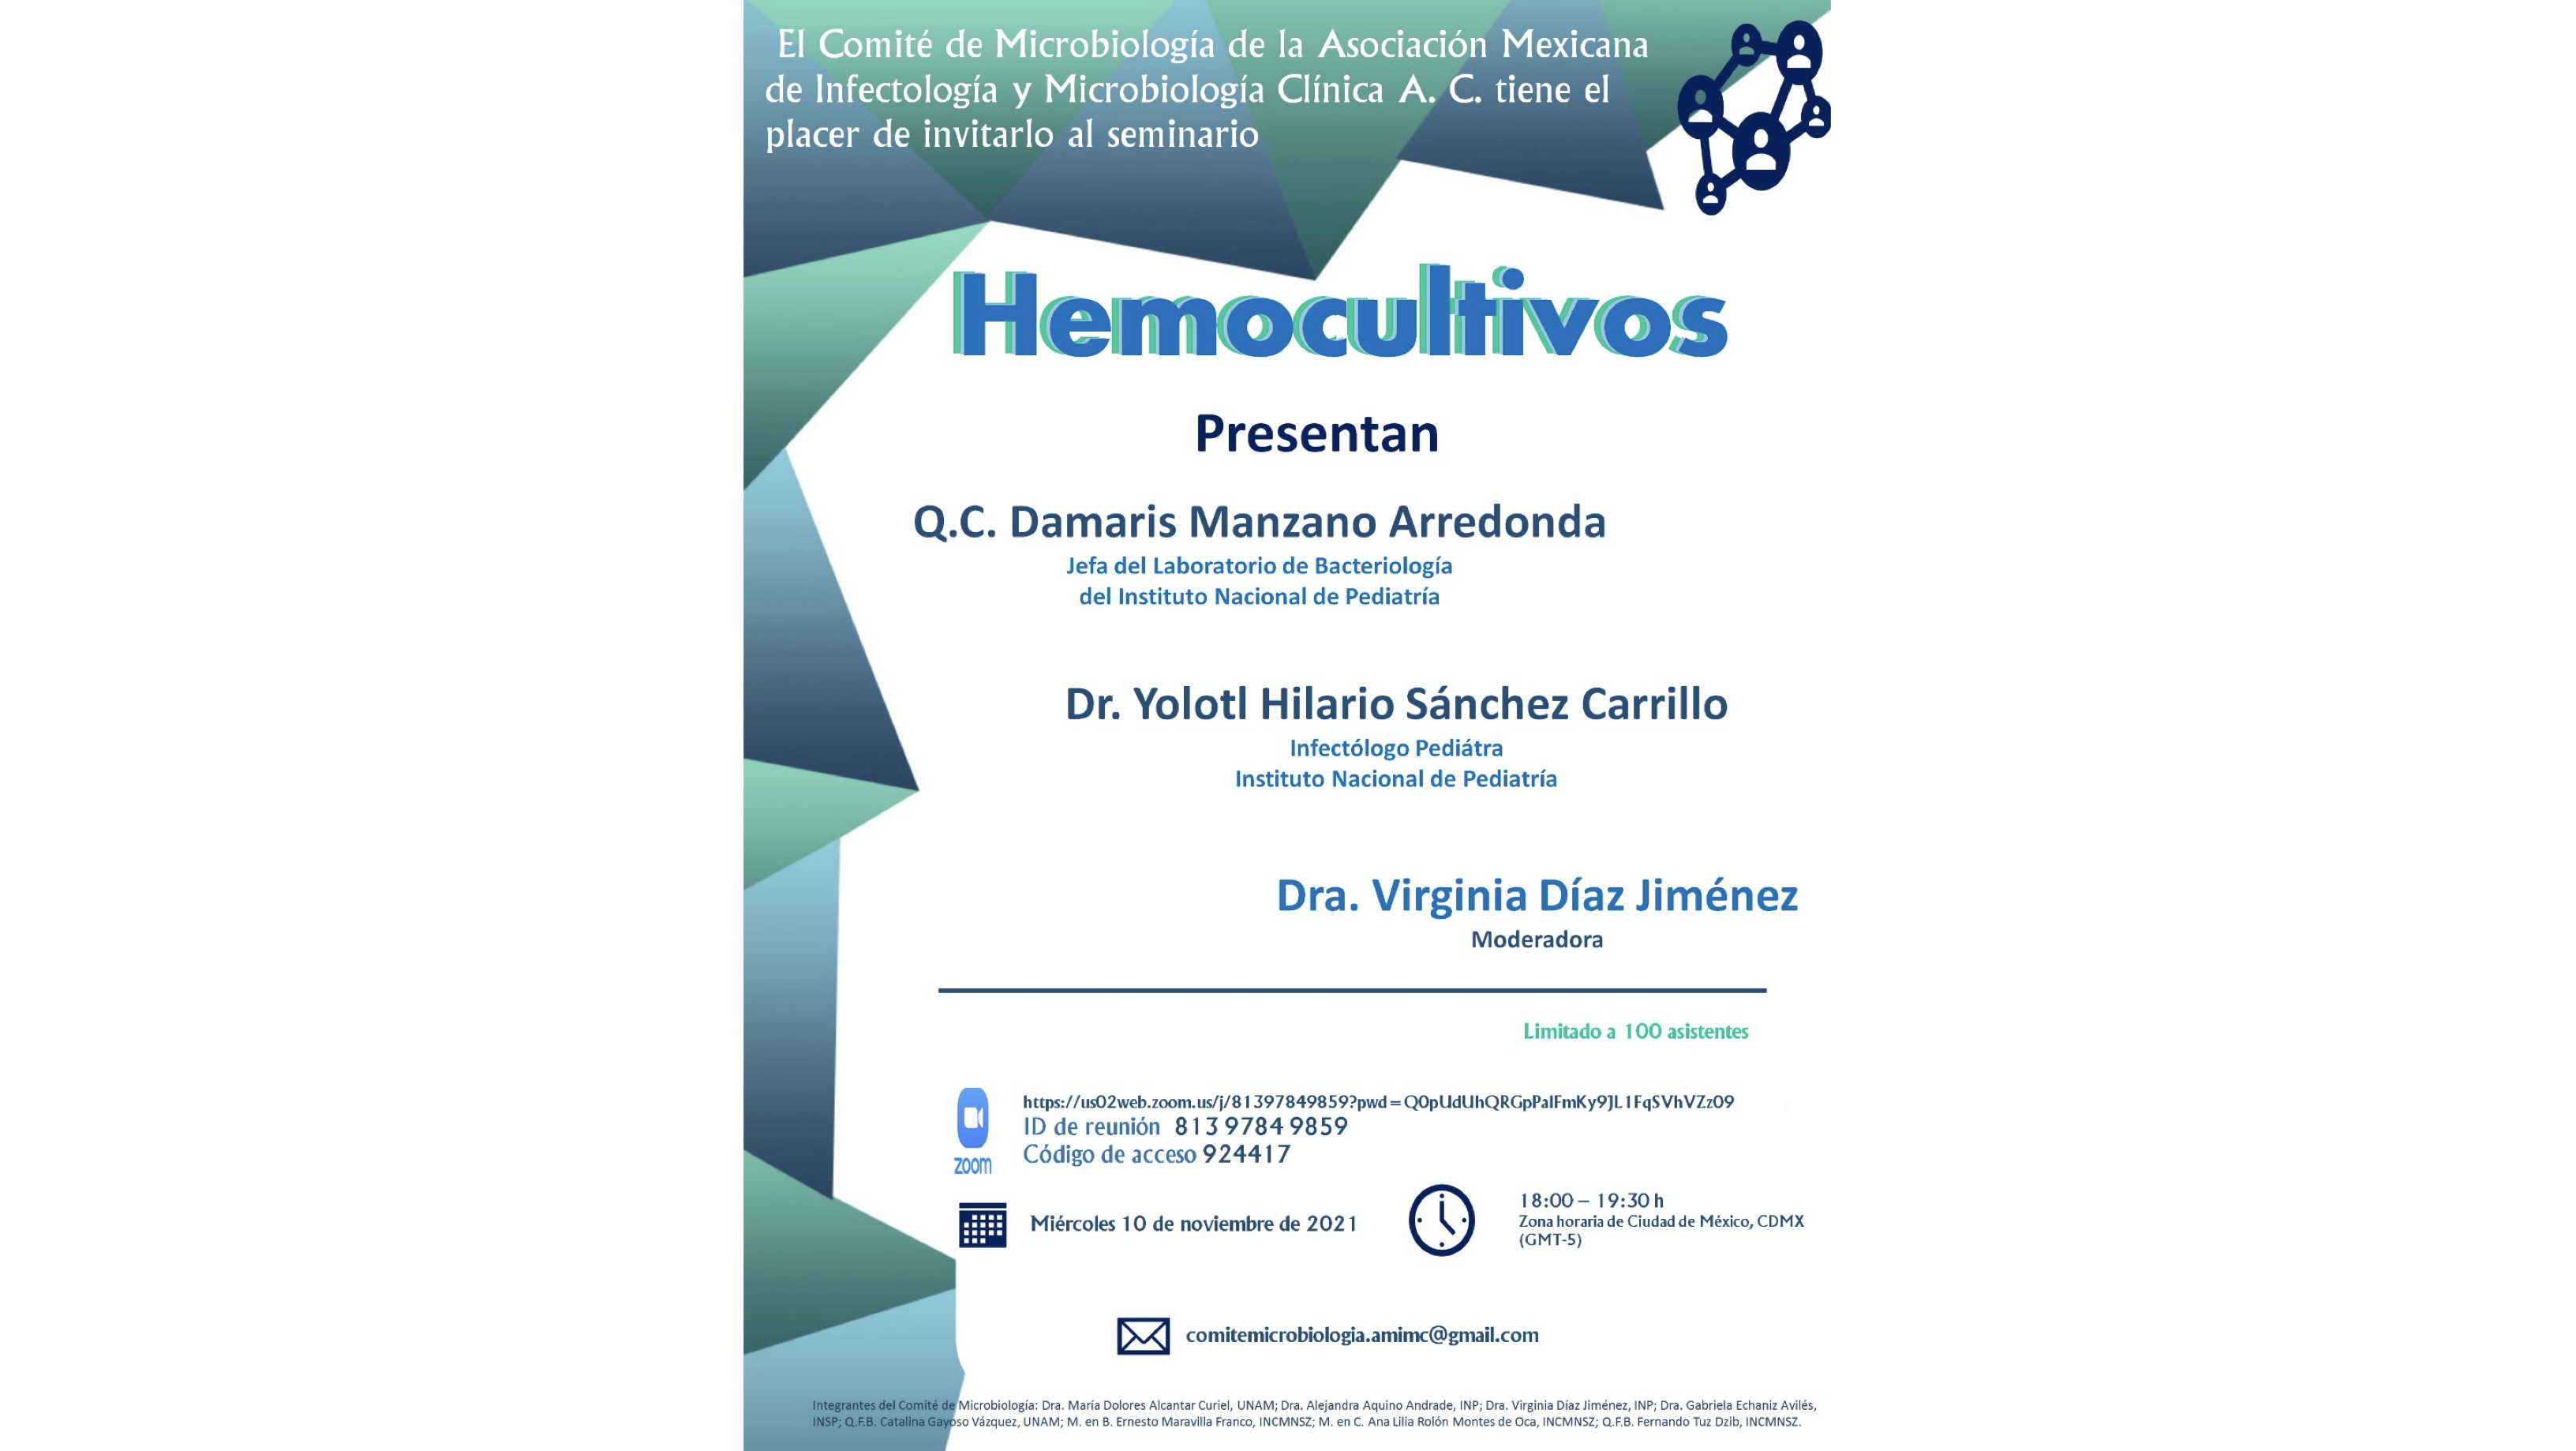 Cartel-1er-Seminario-del-Comité-de-Microbiología-AMIMC-2021